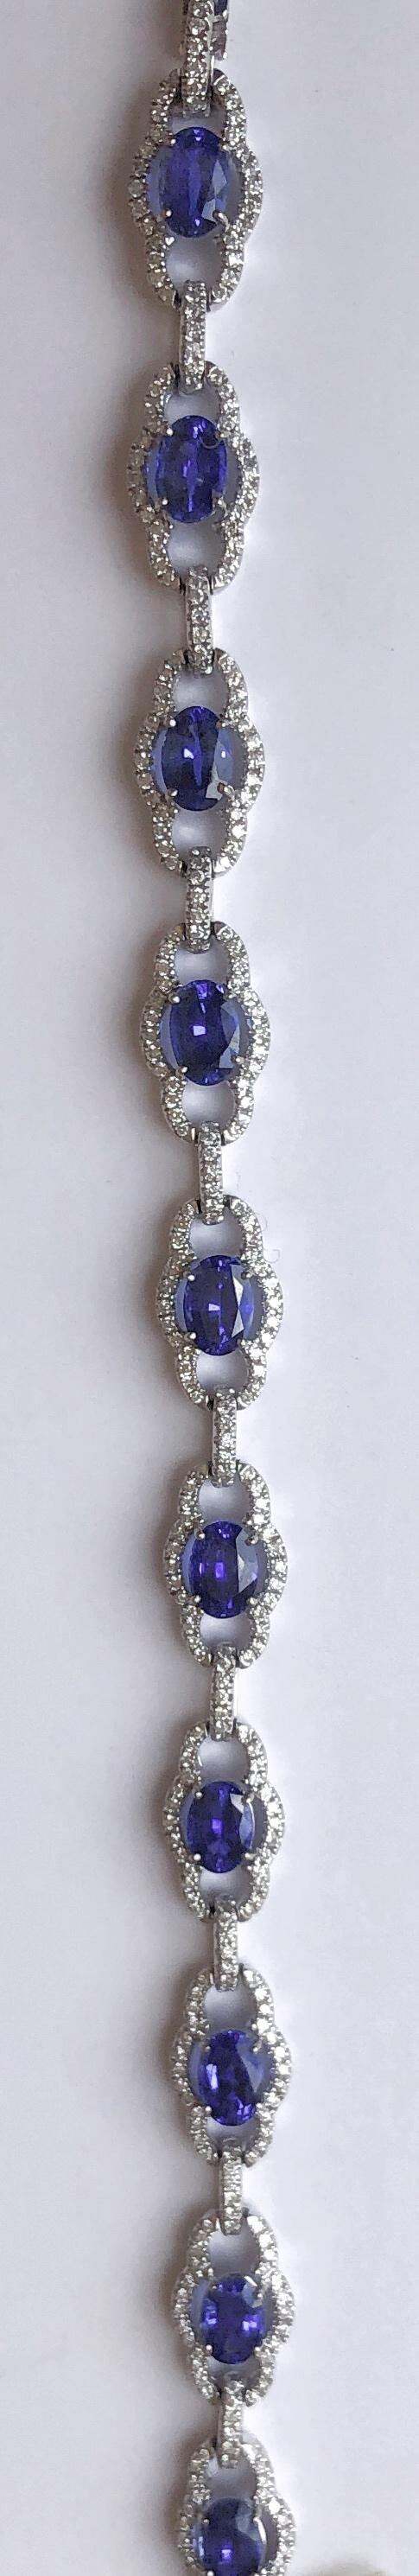 Sapphire Bracelet.JPG